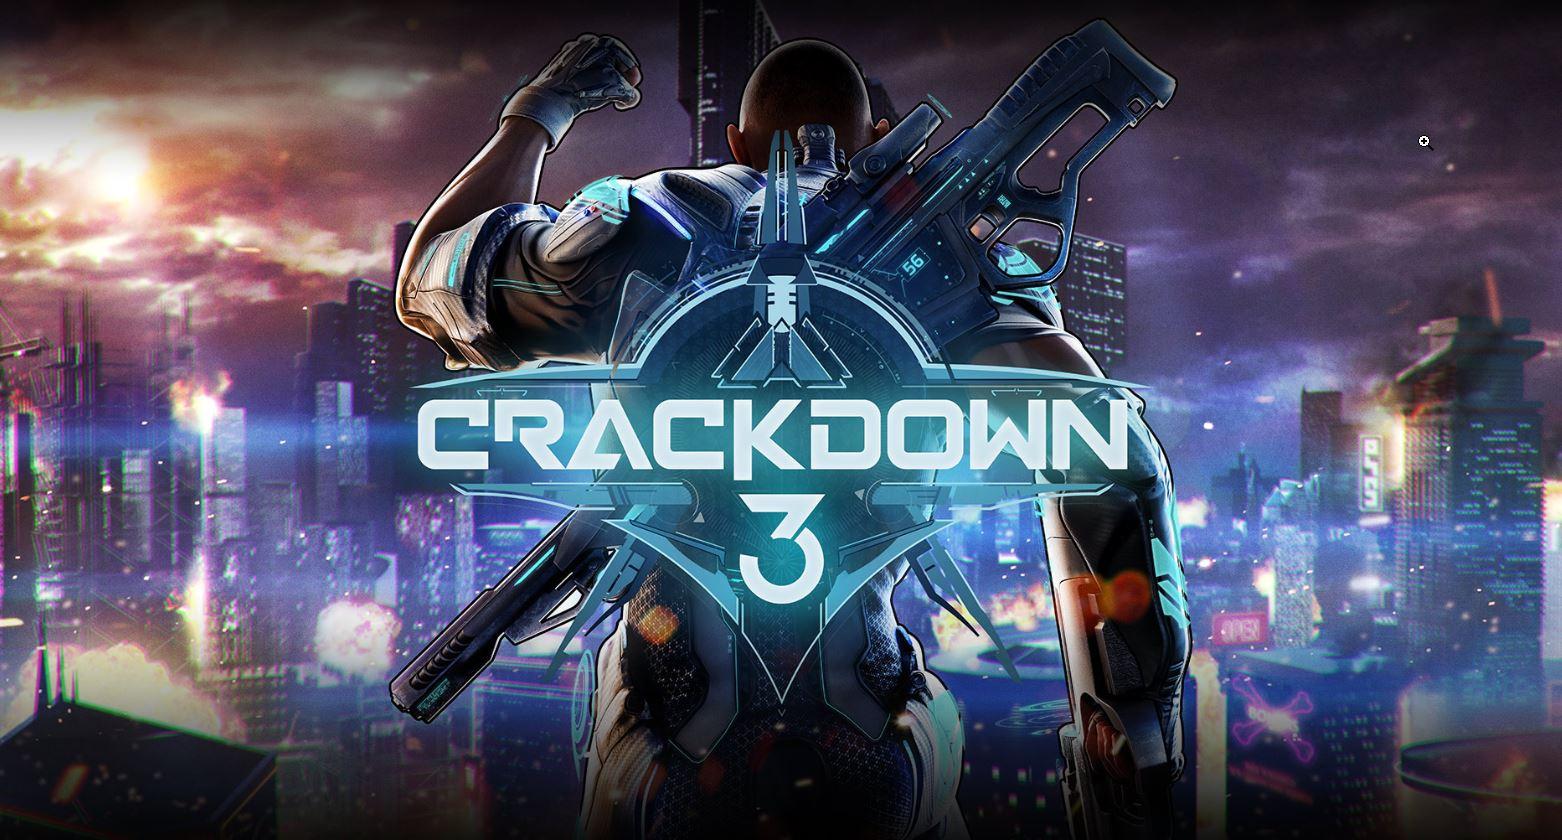 Crackdown 3 gagnez une manette xbox one avec votre for Manette xbox one elite black friday